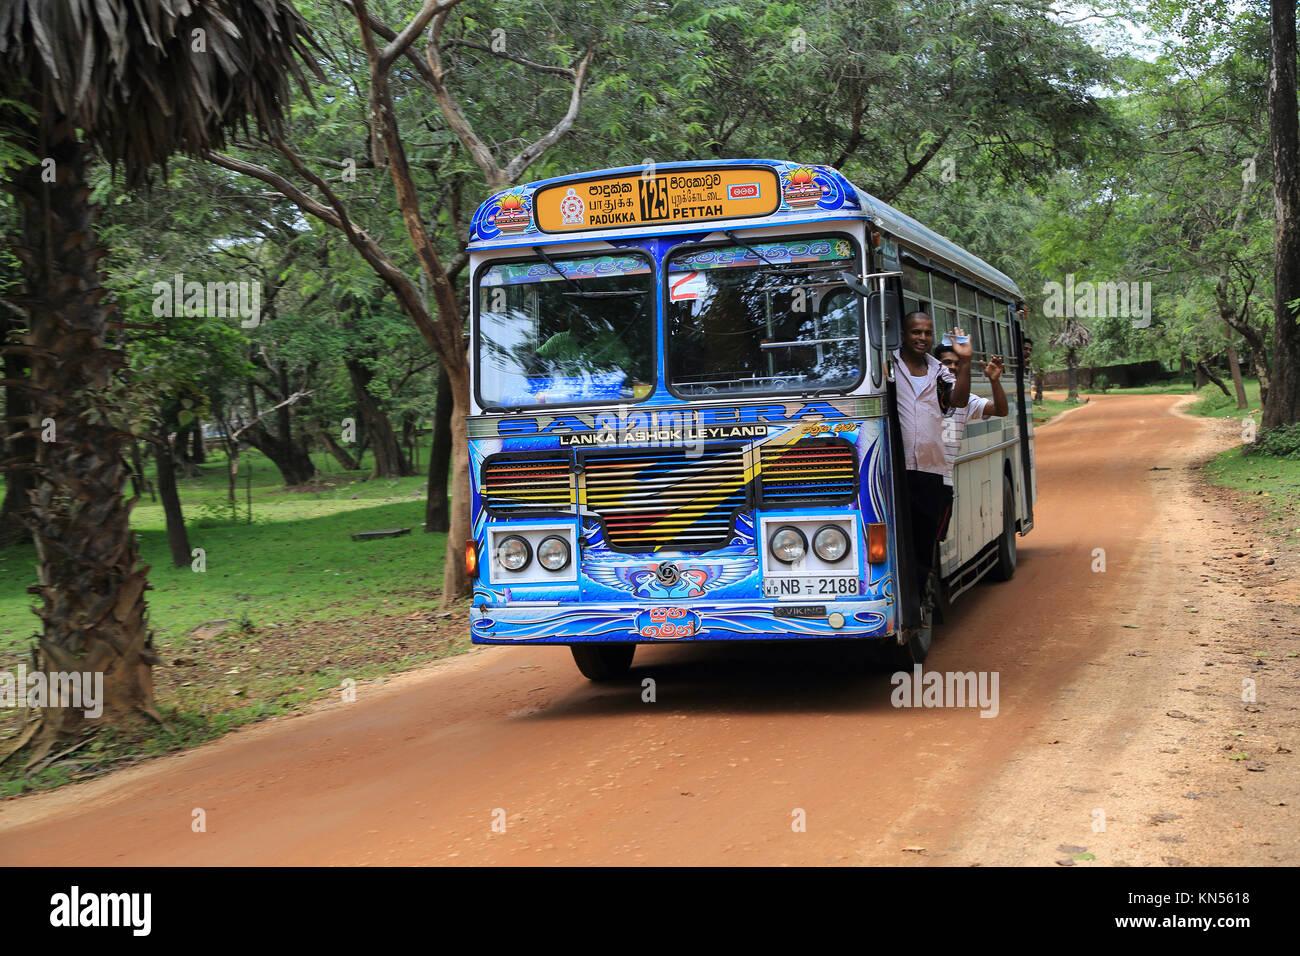 Colourful Lanka Ashok Leyland bus, Polonnaruwa, North Central Province, Sri Lanka, Asia people waving - Stock Image